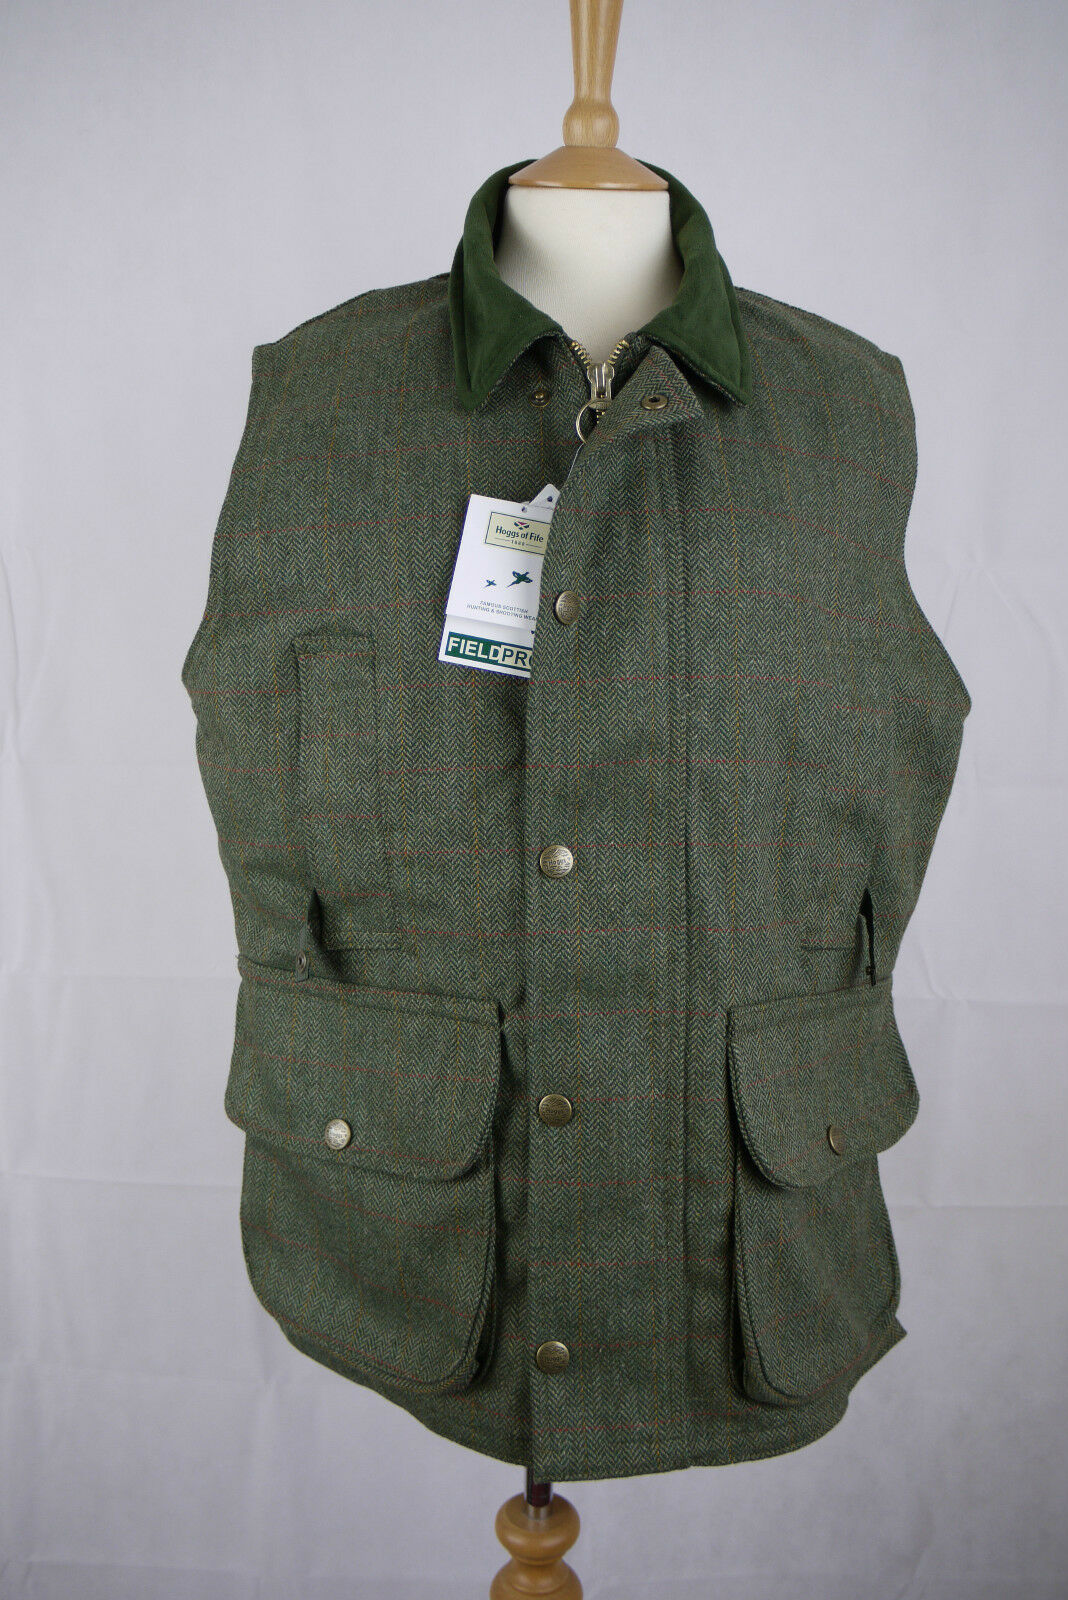 Hoggs Edinburgh Green Tweed Waistcoat - Size Small